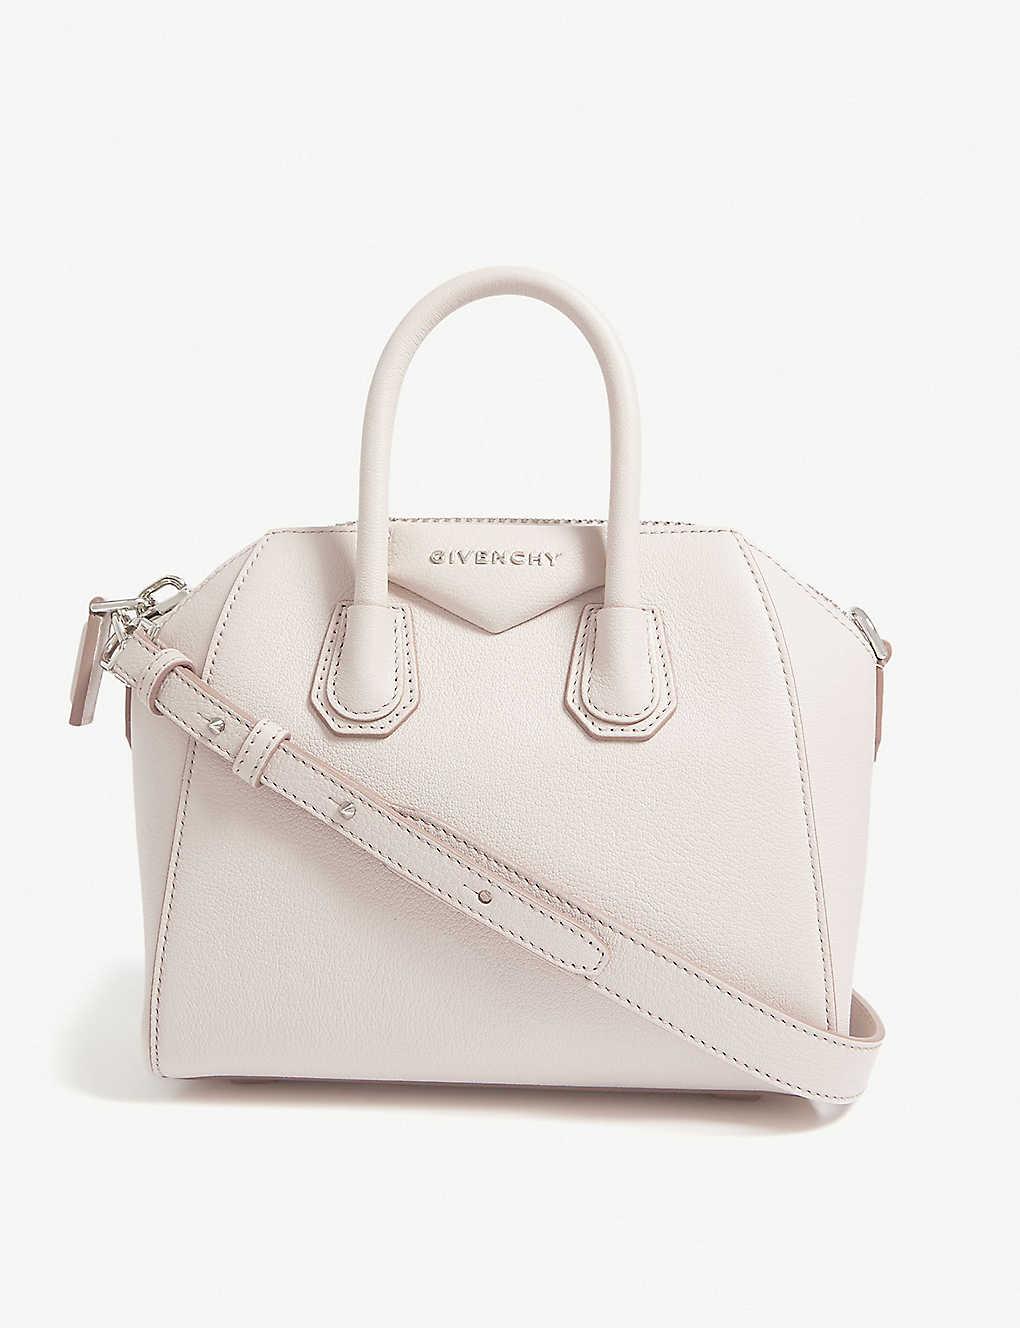 c9f56e4848 GIVENCHY - Antigona mini grained leather tote bag | Selfridges.com